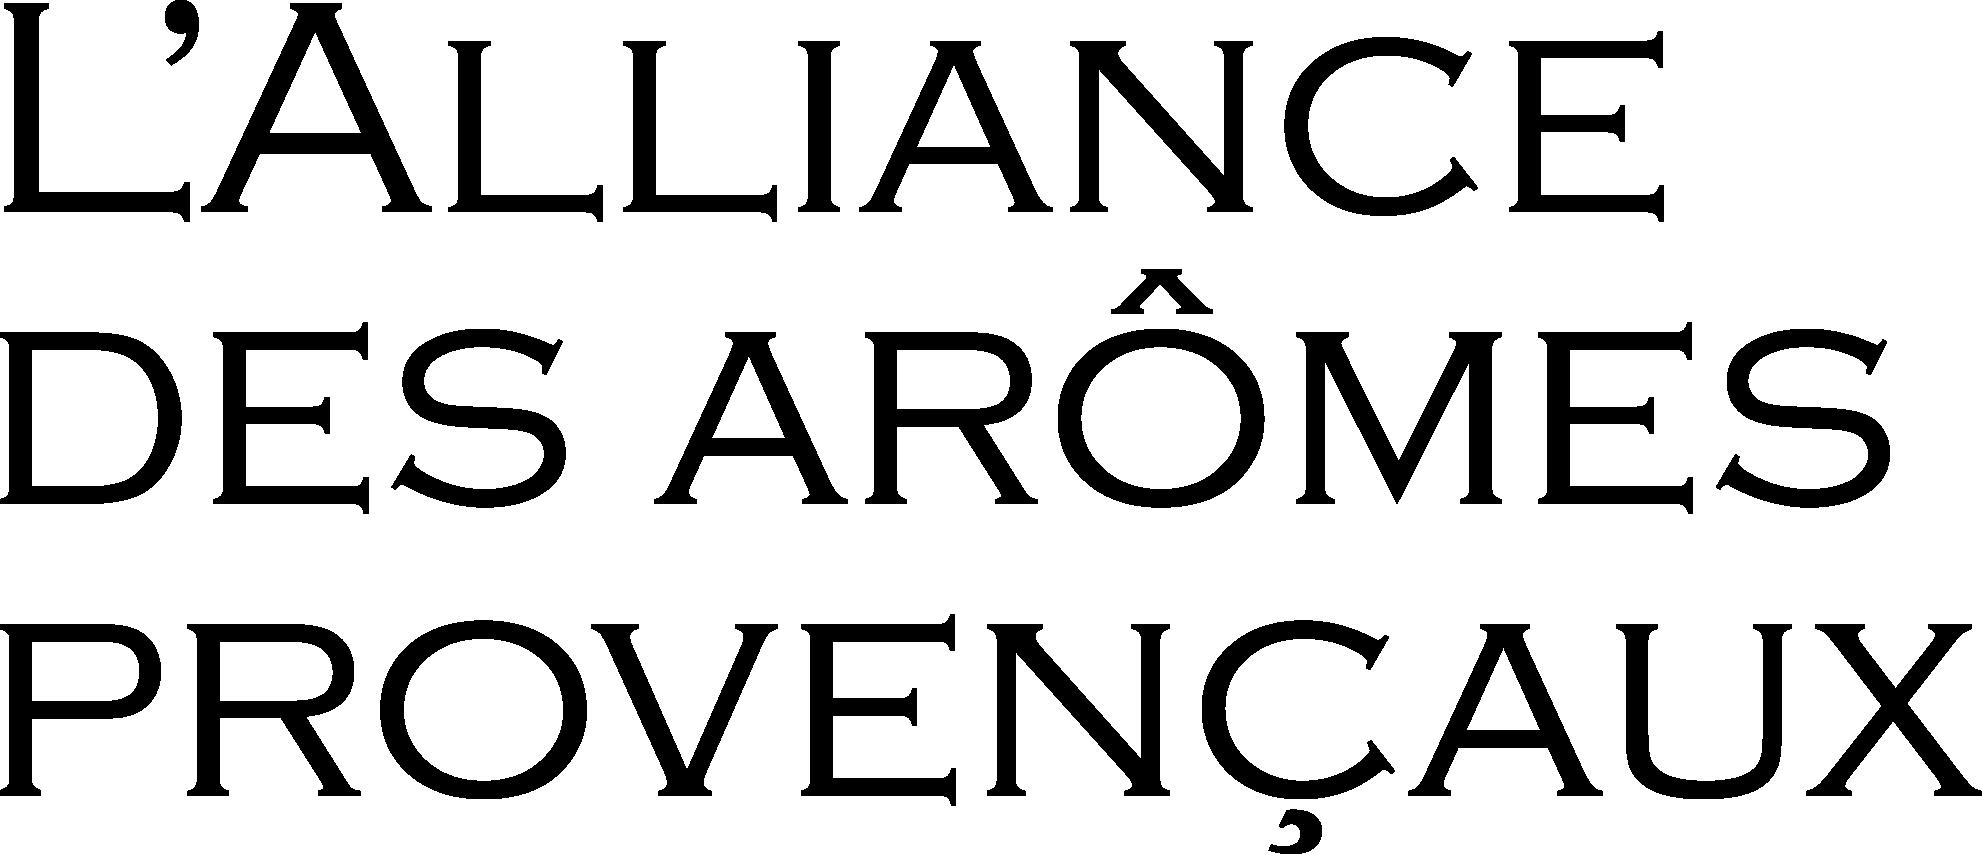 slogan2.png